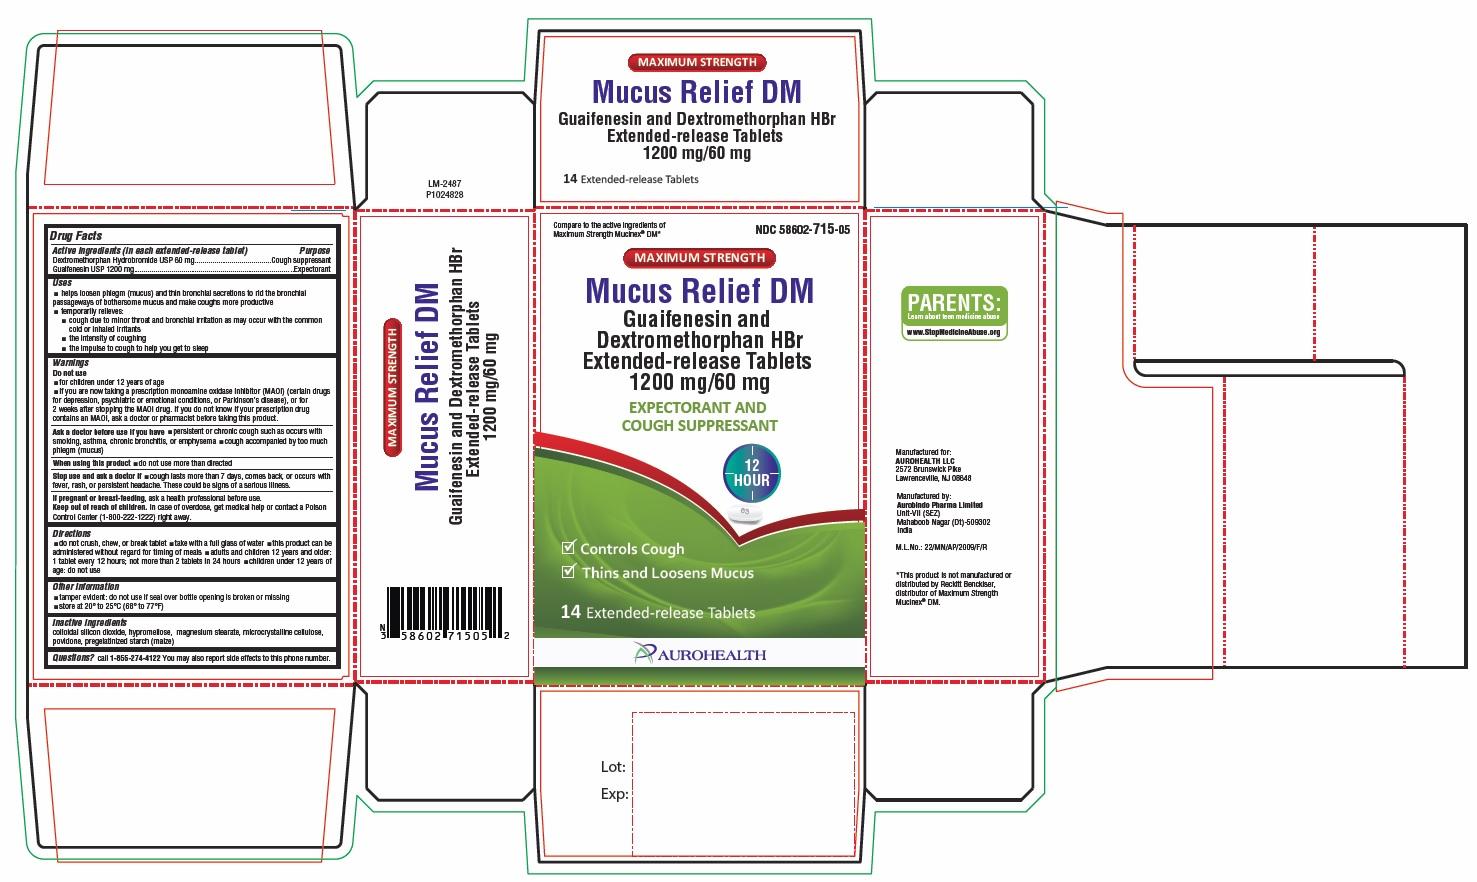 PACKAGE LABEL-PRINCIPAL DISPLAY PANEL - 1200 mg/60 mg (14 Tablet Carton Label)